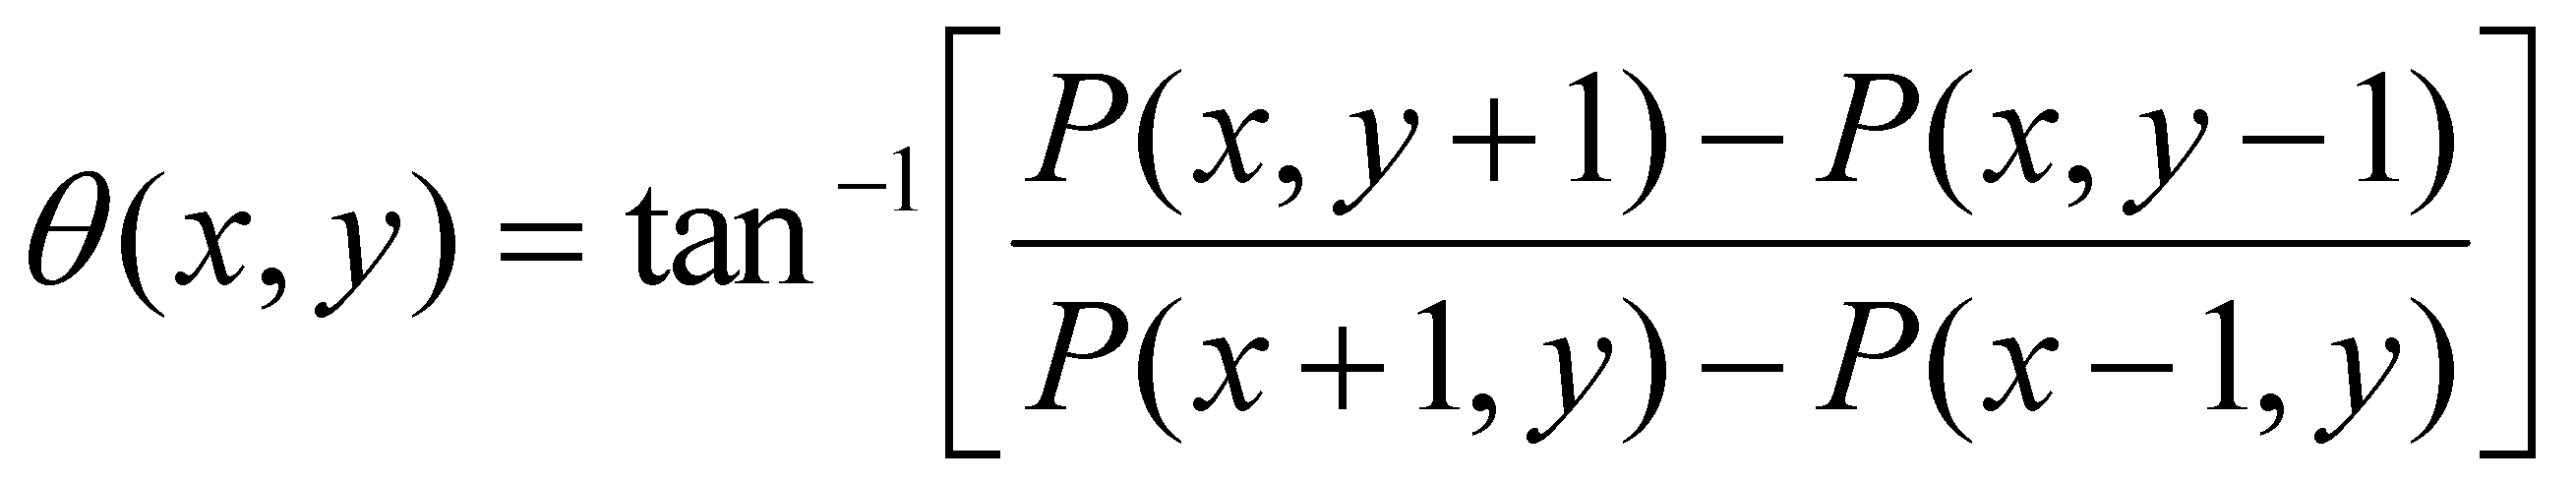 Figure 112010067831763-pat00004